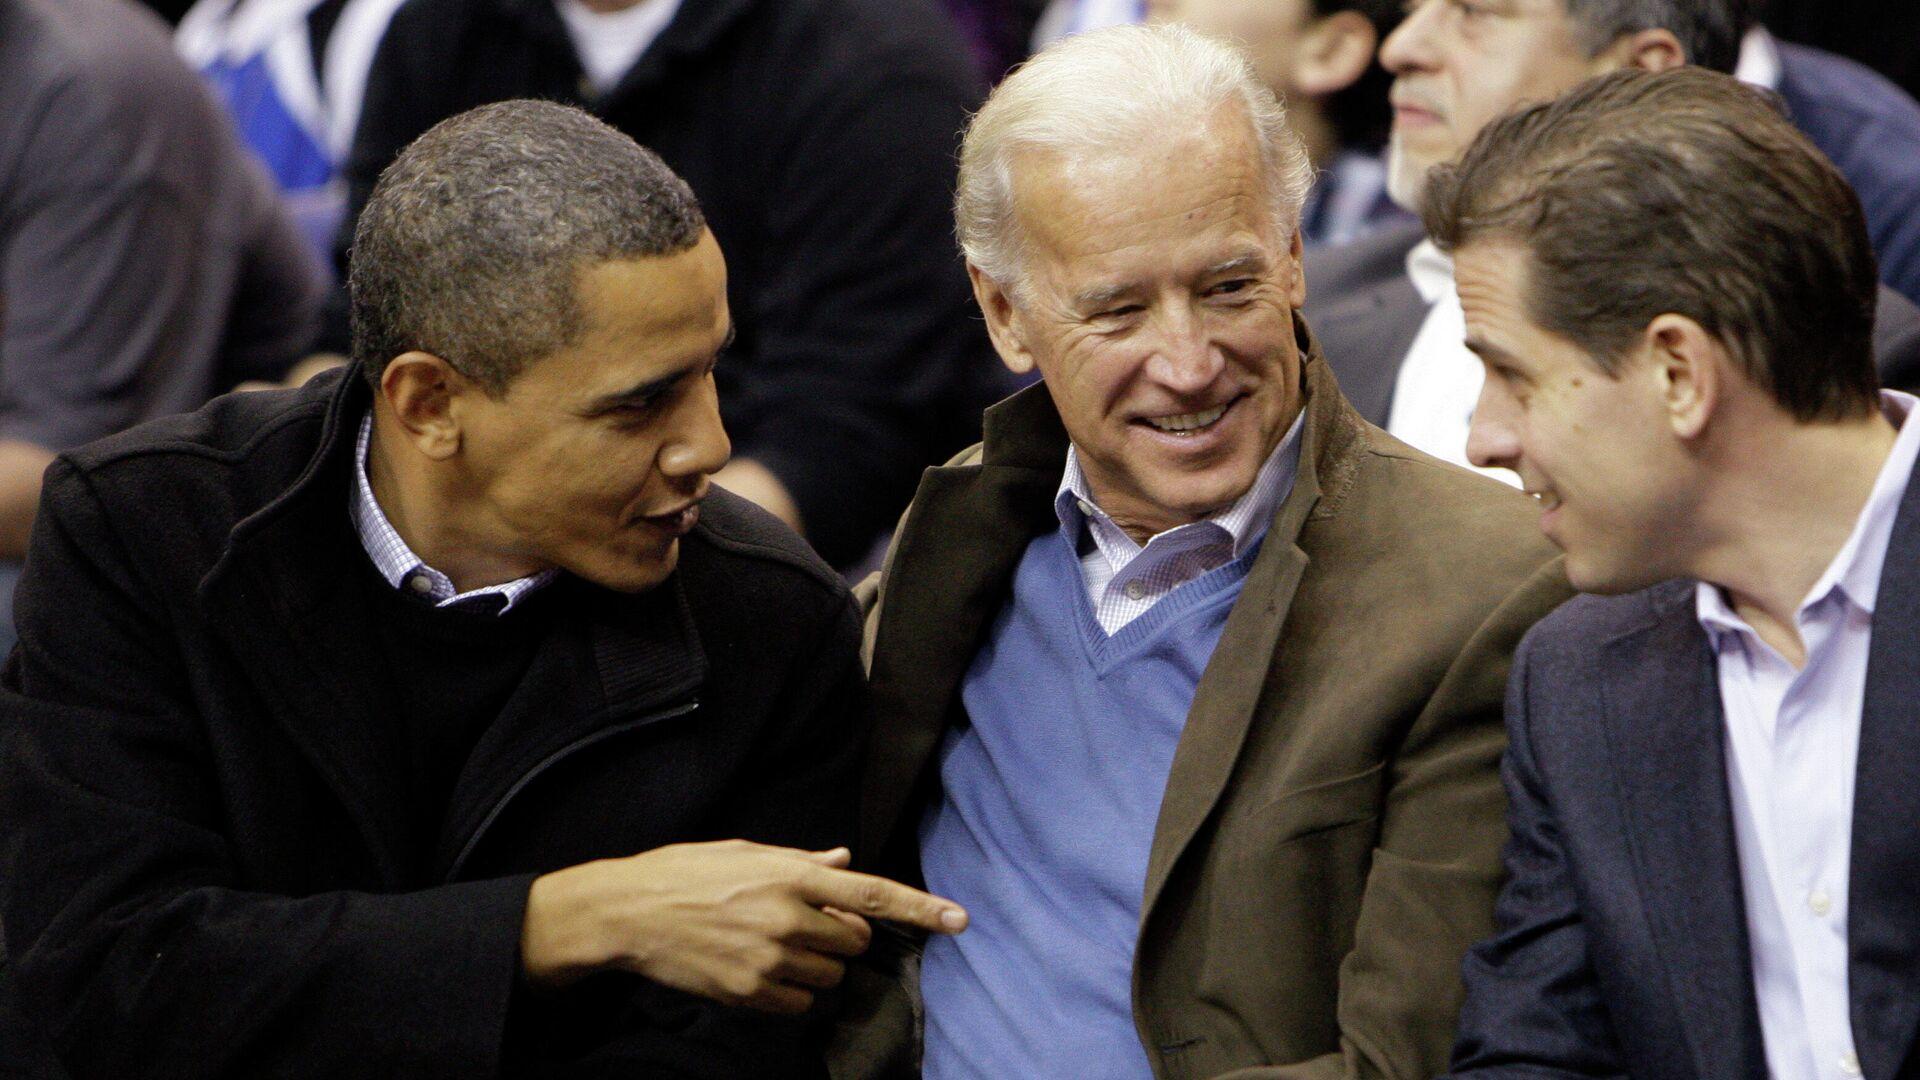 Barack Obama junto a Joe y Hunter Biden en 2010 - Sputnik Mundo, 1920, 09.06.2021